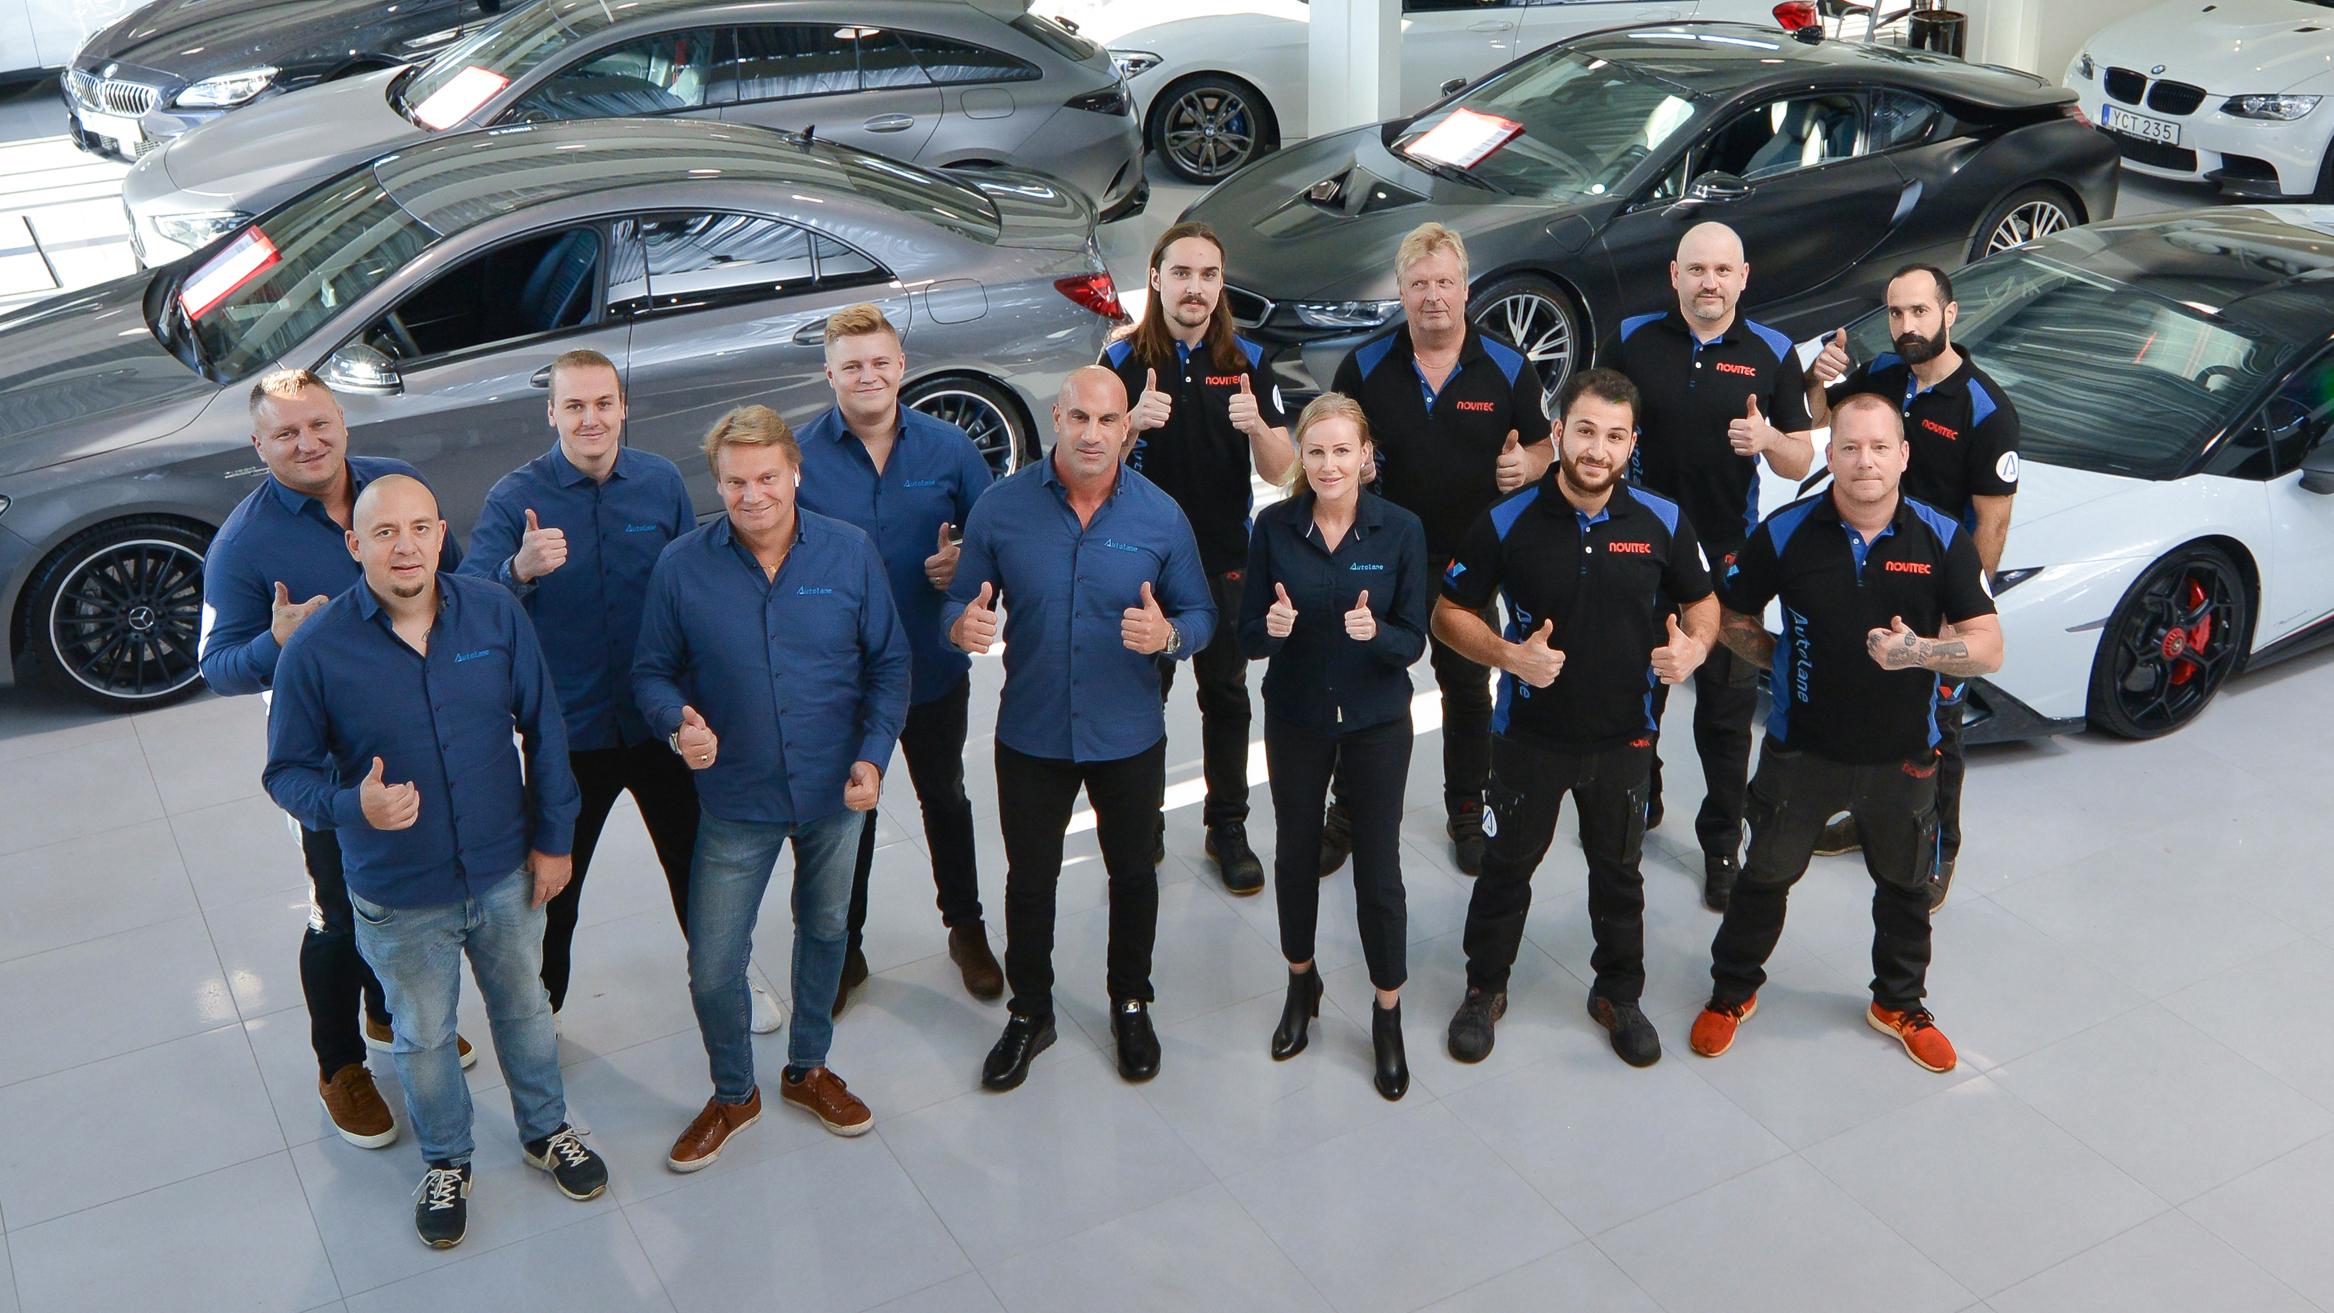 Bilhandlare Göteborg | Bilfirma Kungälv | Bilar | MC | Autolane